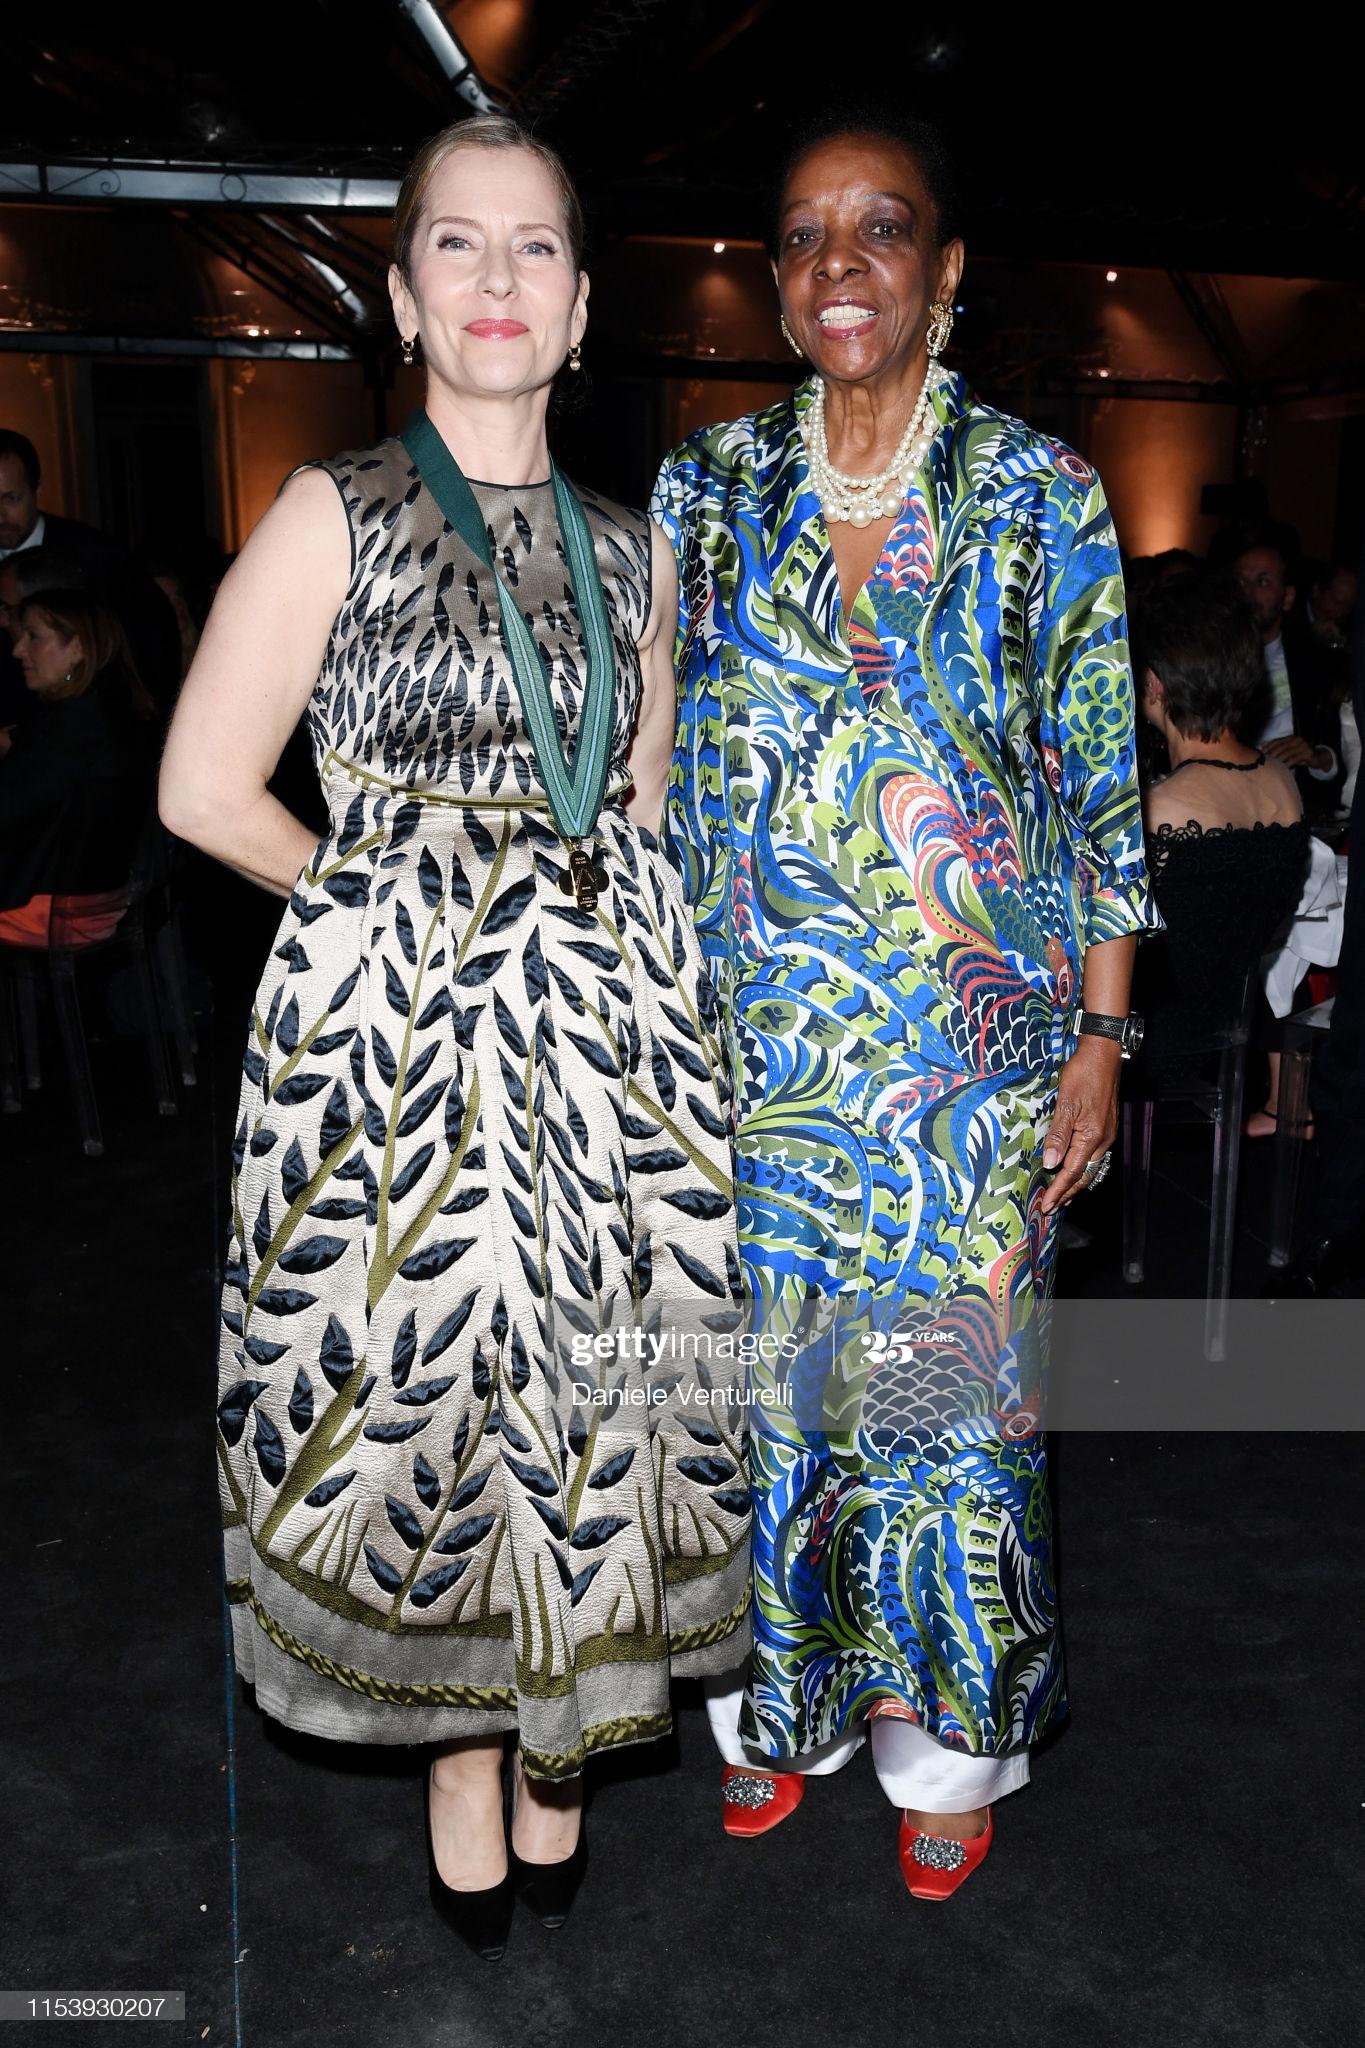 Paola Antonelli y Marva Griffin Wilshire en la gala de McKim Medal 2019 at Villa Aurelia on June 05, 2019 in Roma, Italia. Foto Daniele Venturelli/Getty Images